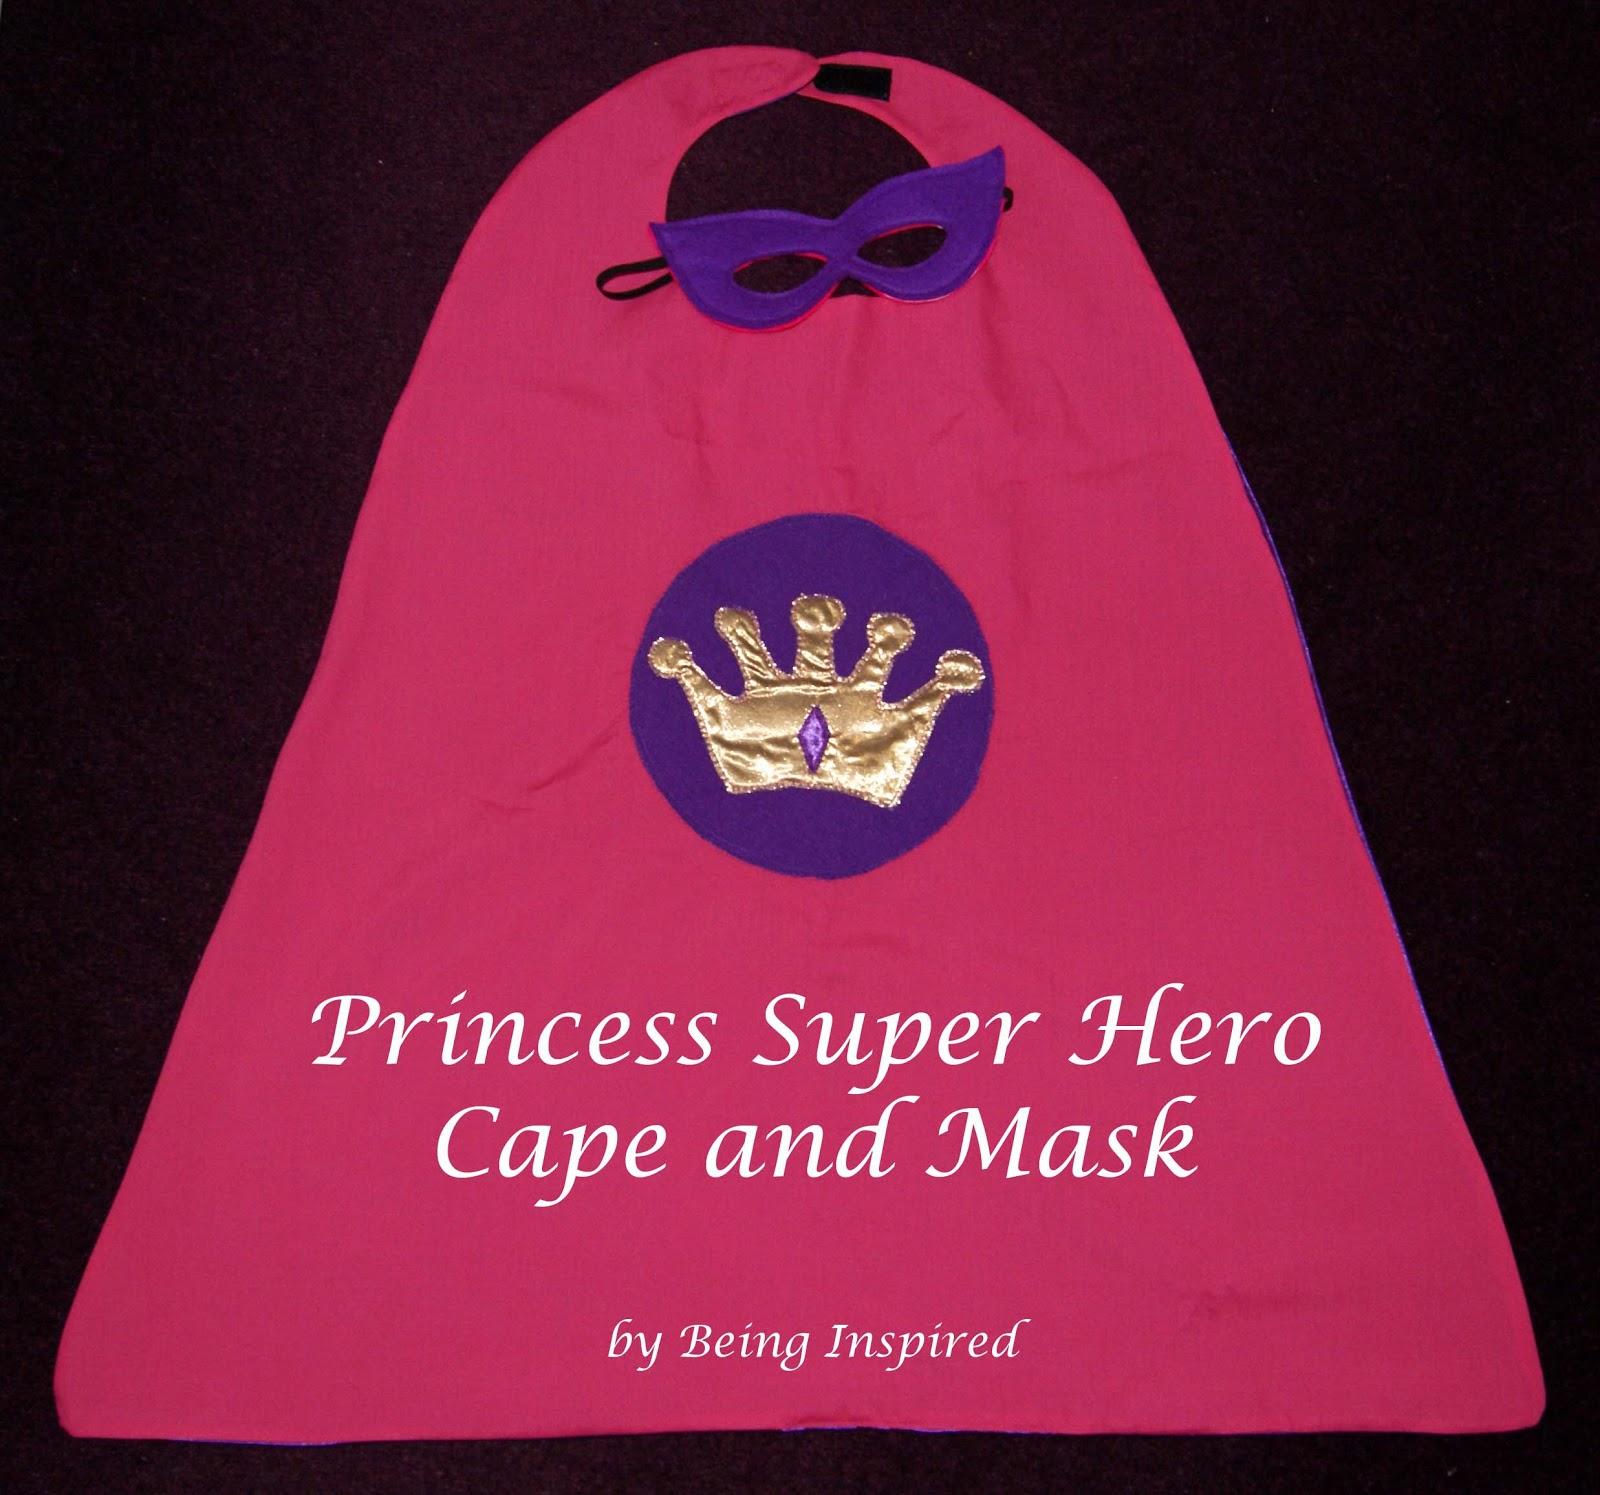 http://1.bp.blogspot.com/-bsLCPDT1ICw/UMjKjLmUFrI/AAAAAAAAAGM/2jV7K92WQYY/s1600/Princess+Super+Hero+Cape.jpg